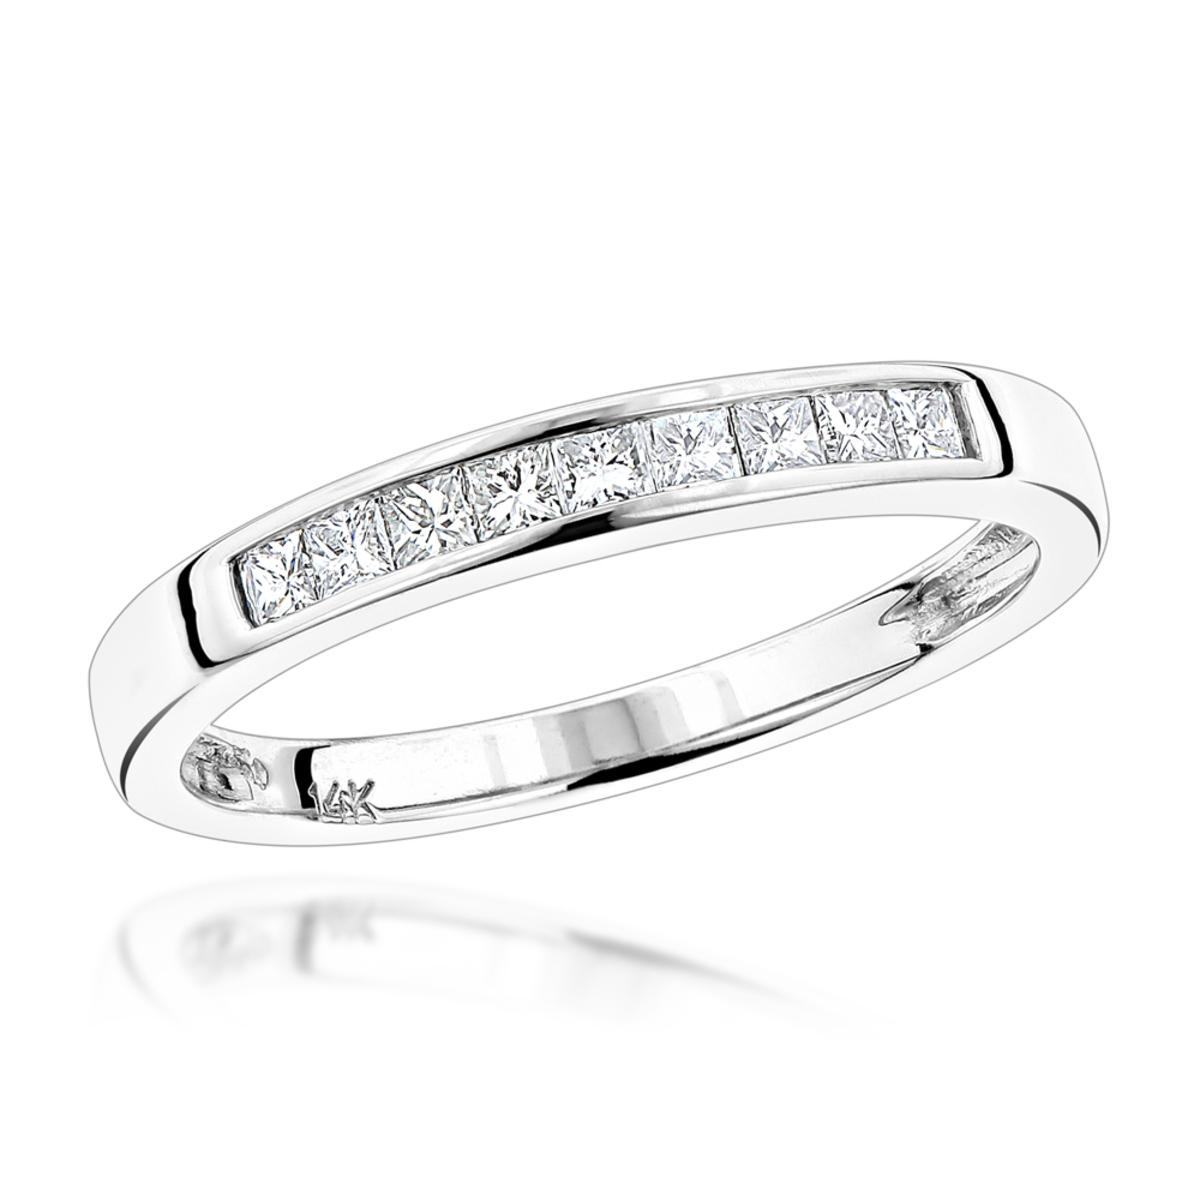 Thin 14K Gold Princess Cut Diamond Wedding Band for Women by Luxurman 0.35c